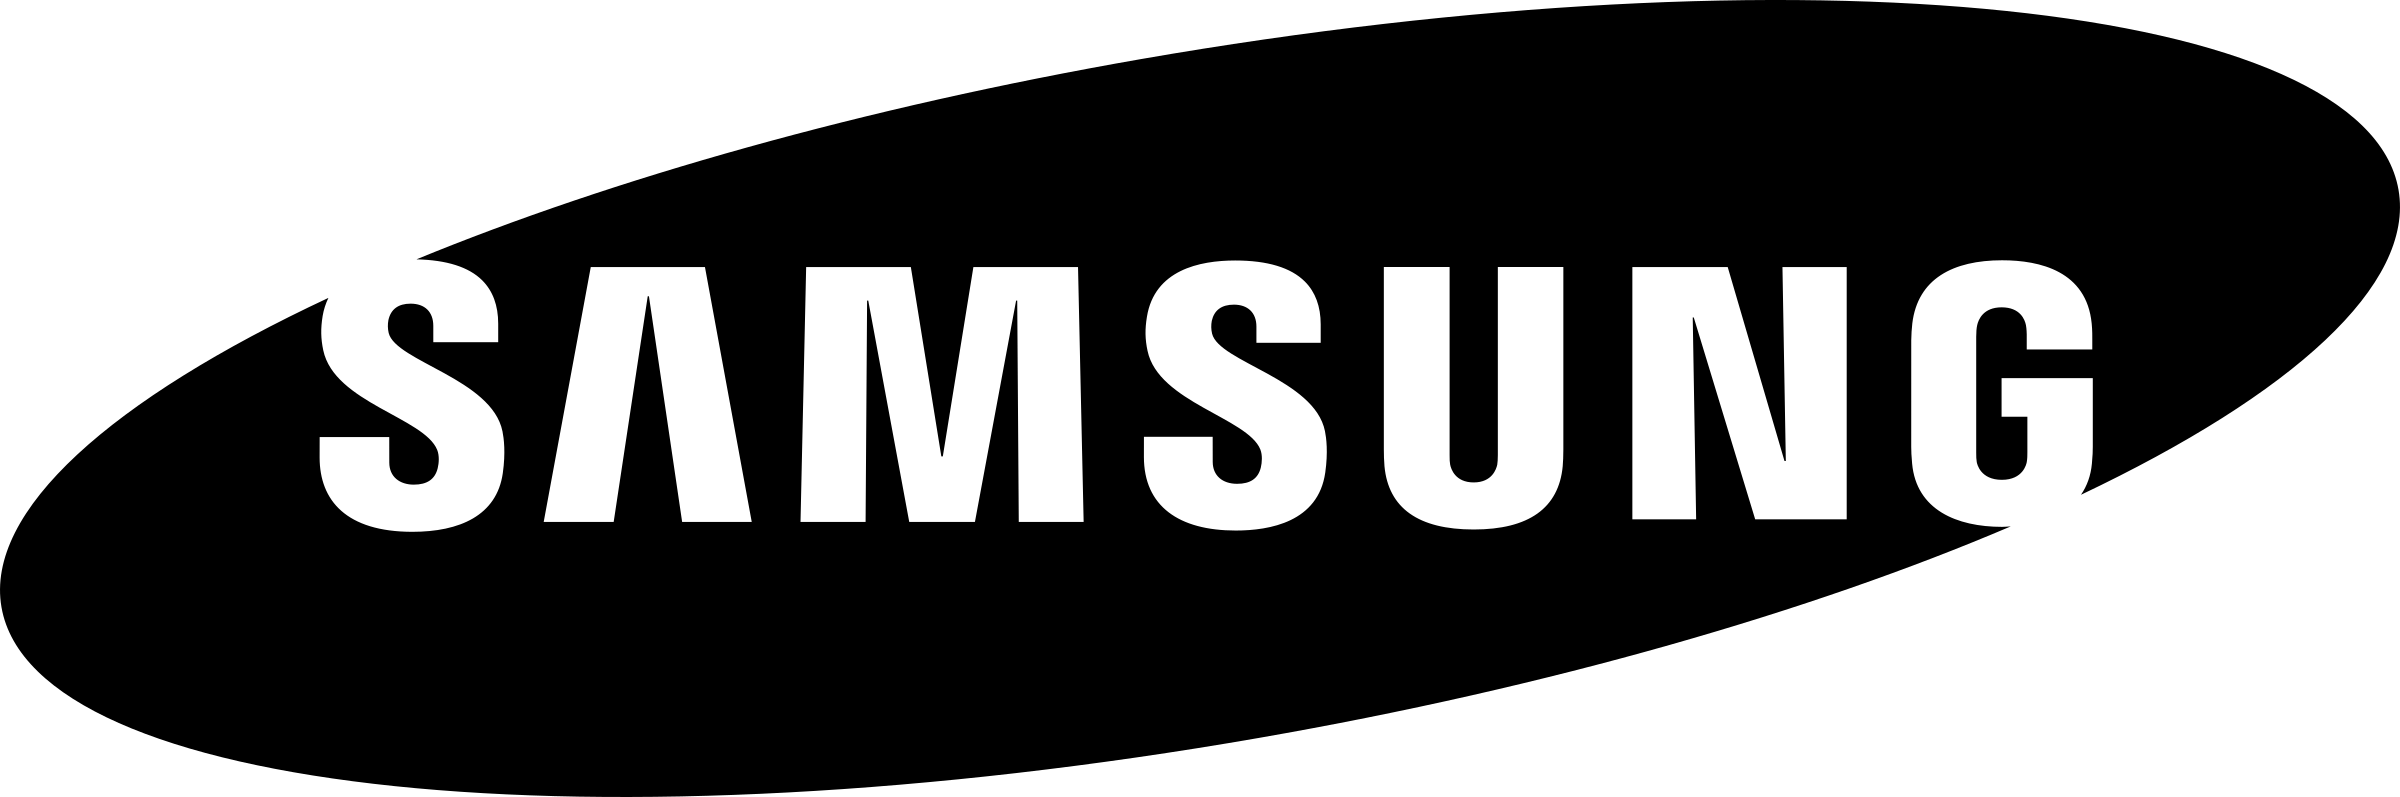 samsung-black-and-white-logo